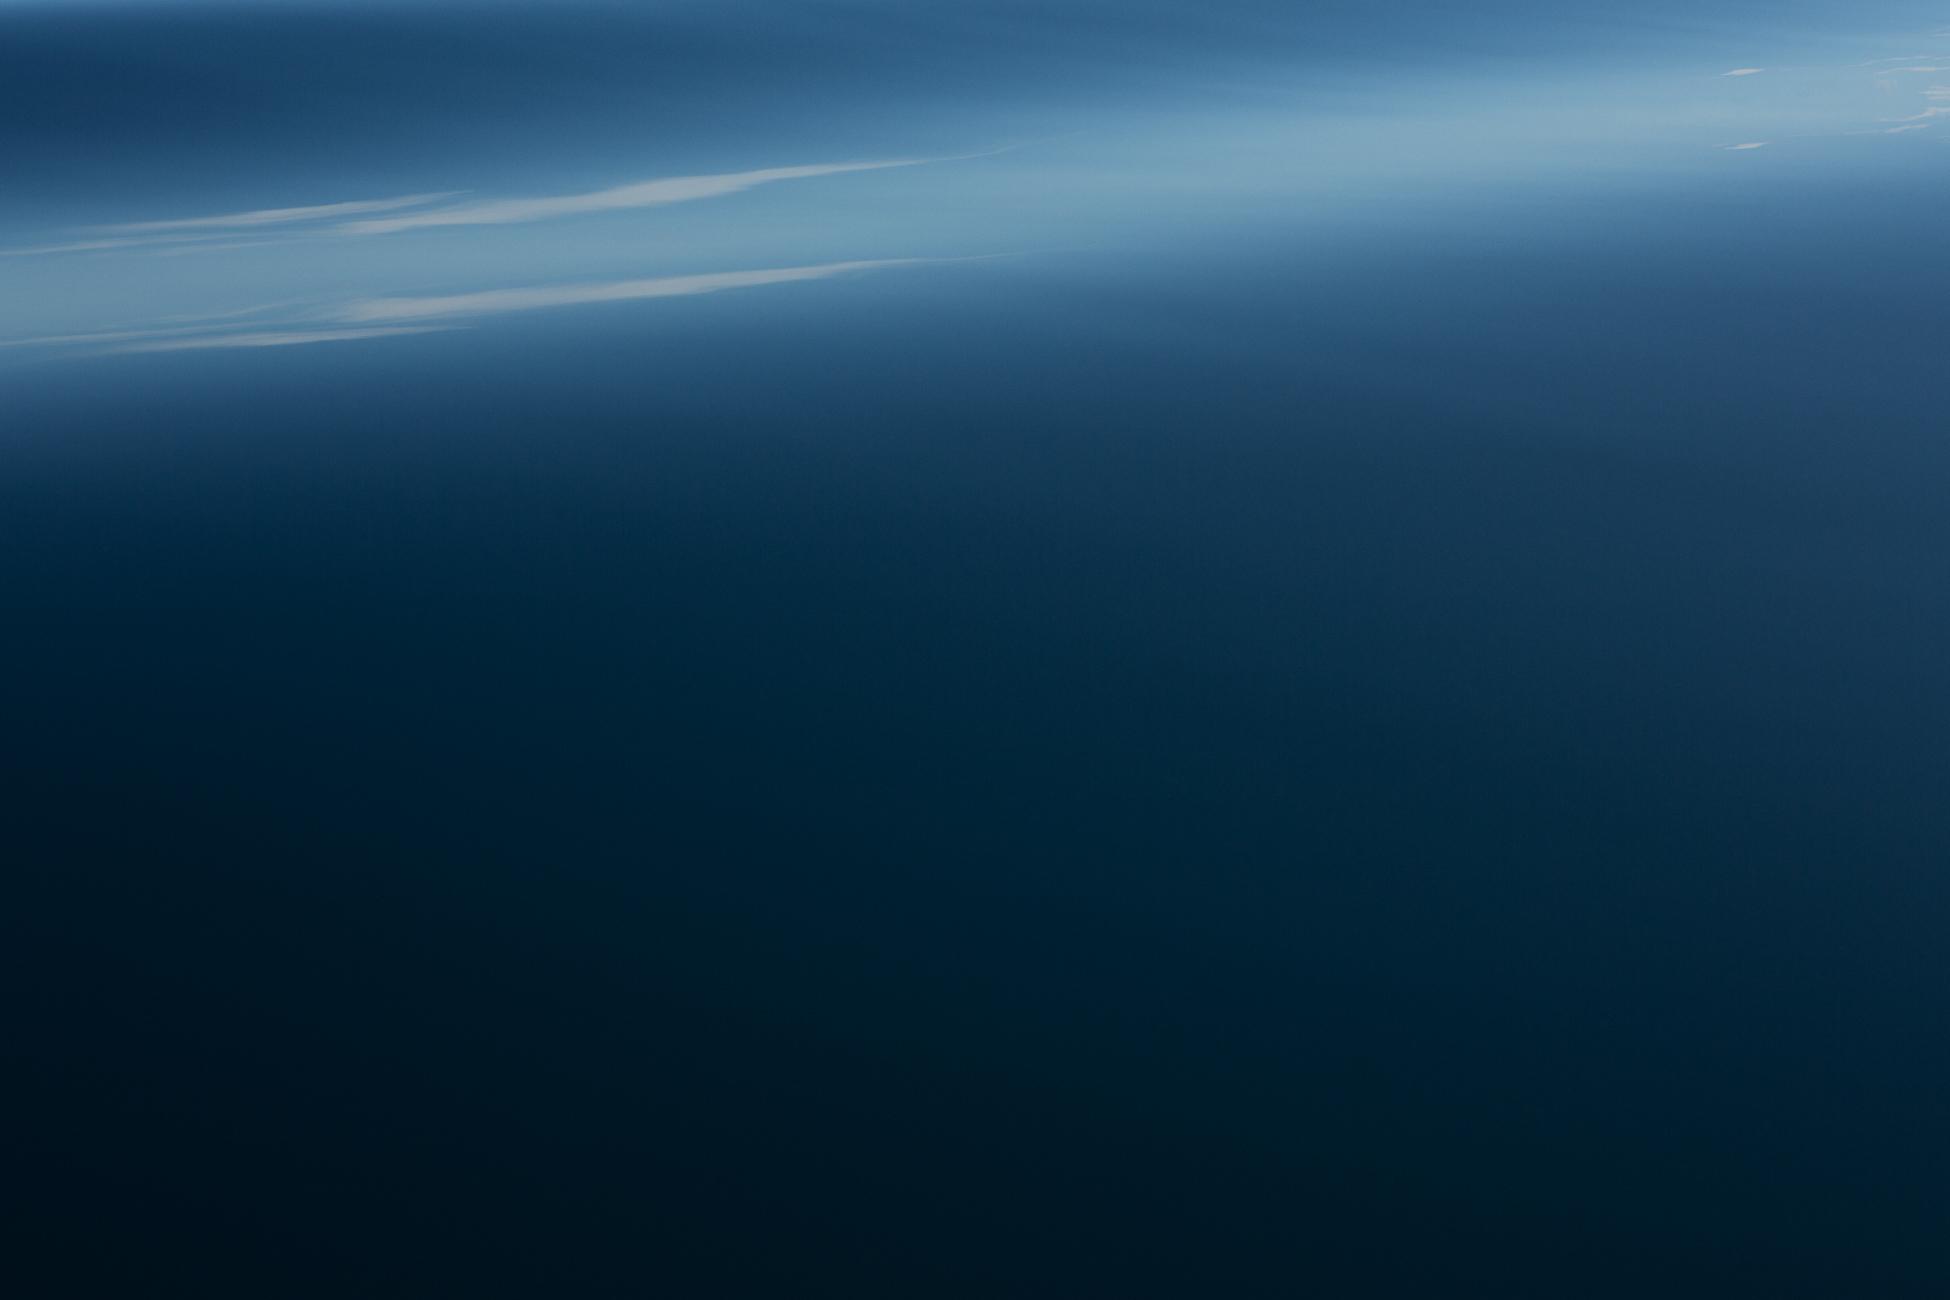 Water IV, 2014 //  120 cm x 180 cm